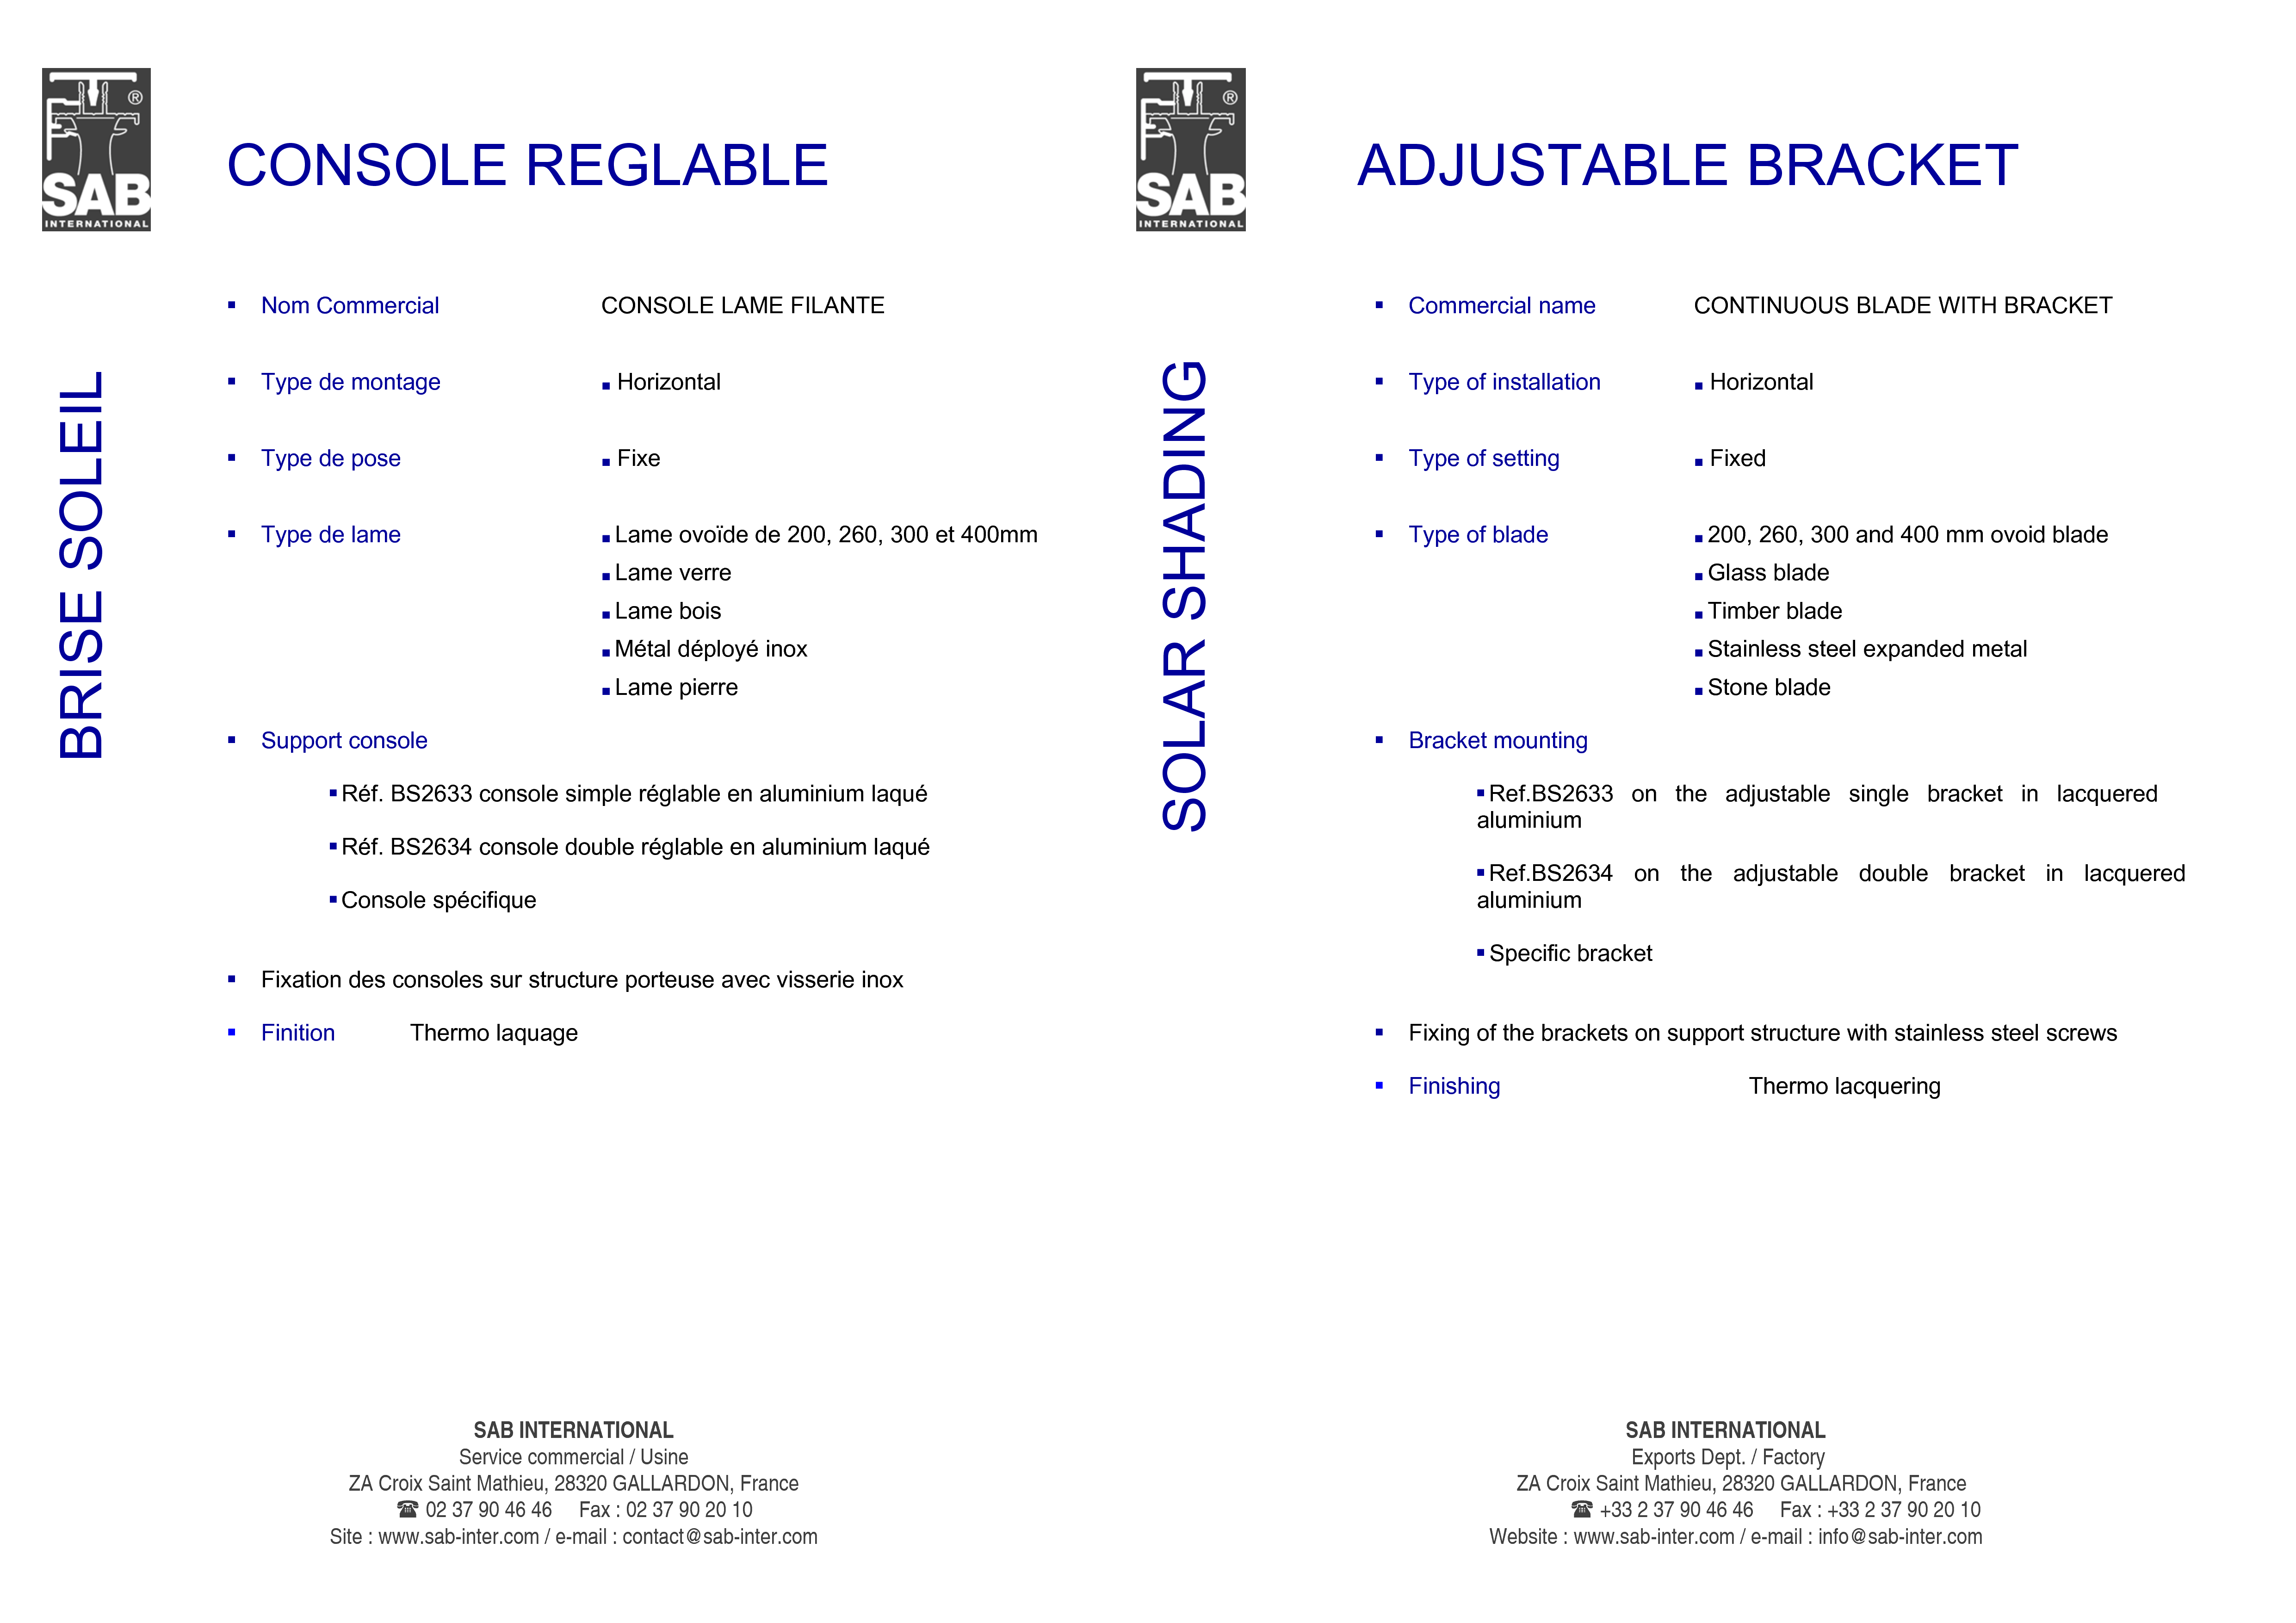 Pagina 4 - CAD-PDF Sisteme de brissoleil-uri SAB Detaliu de produs CONSOLE